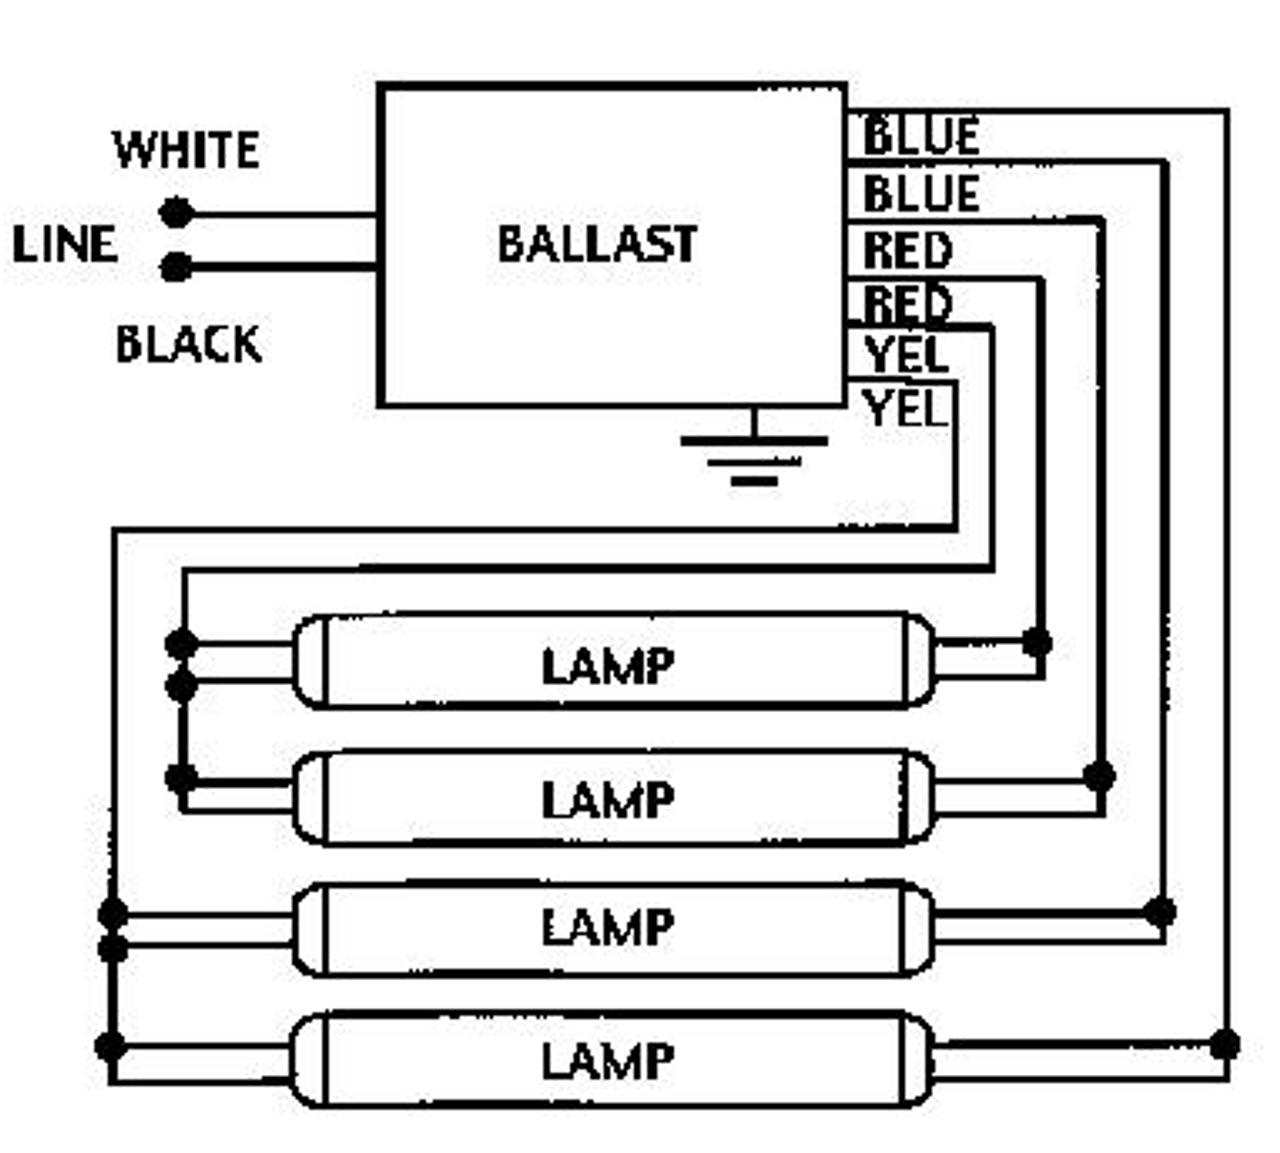 ge432 max g n 74463 ge electronic t8 ballast on t5 electronic ballast t5 ge f40t12 ballast wiring diagram  [ 1280 x 1153 Pixel ]